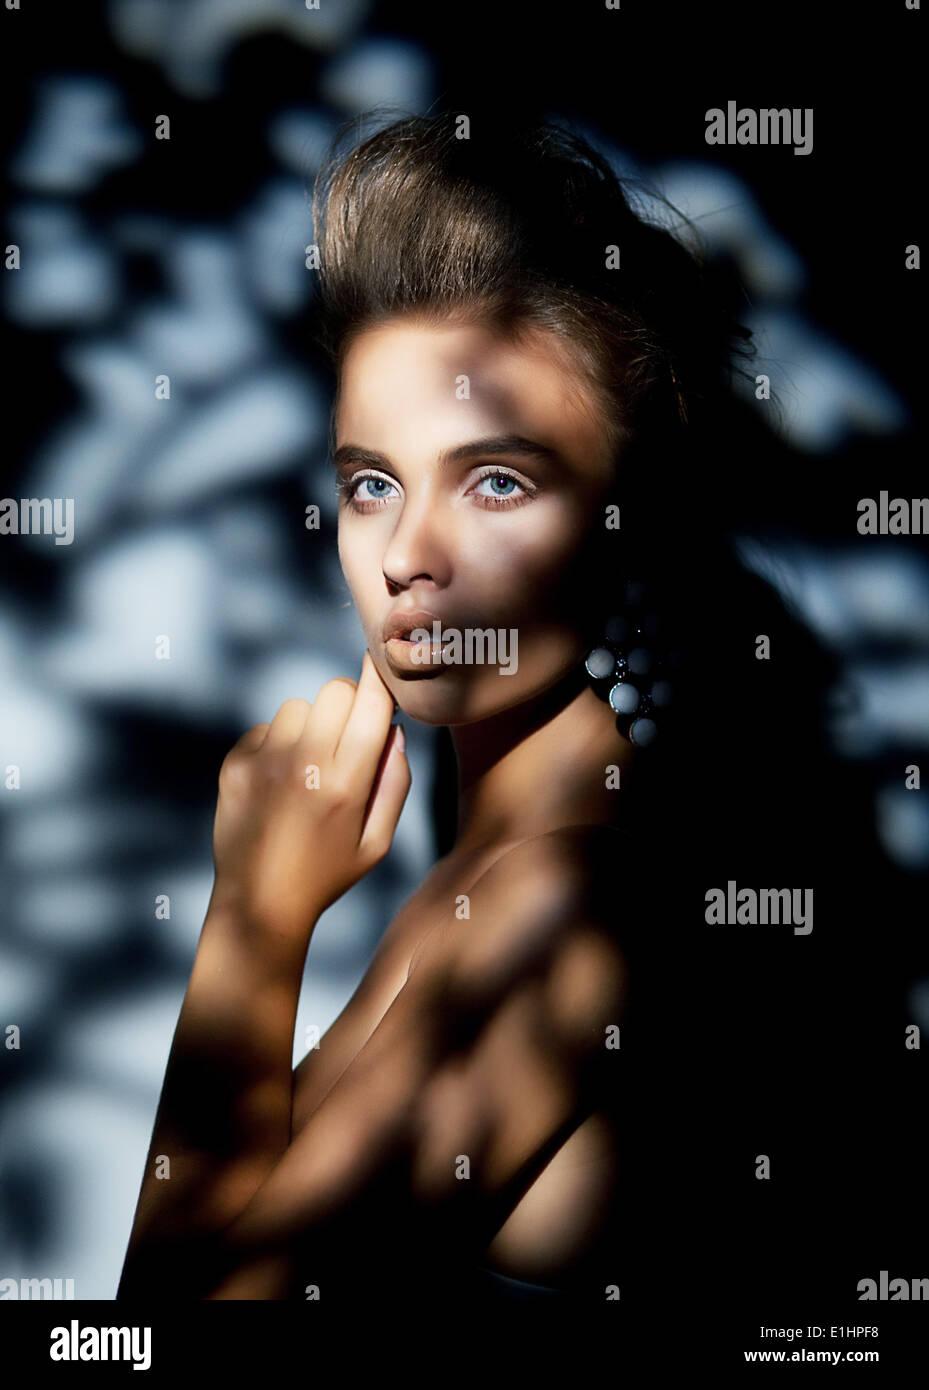 Hermoso rostro femenino en blurrs bokeh sombras azules Foto de stock